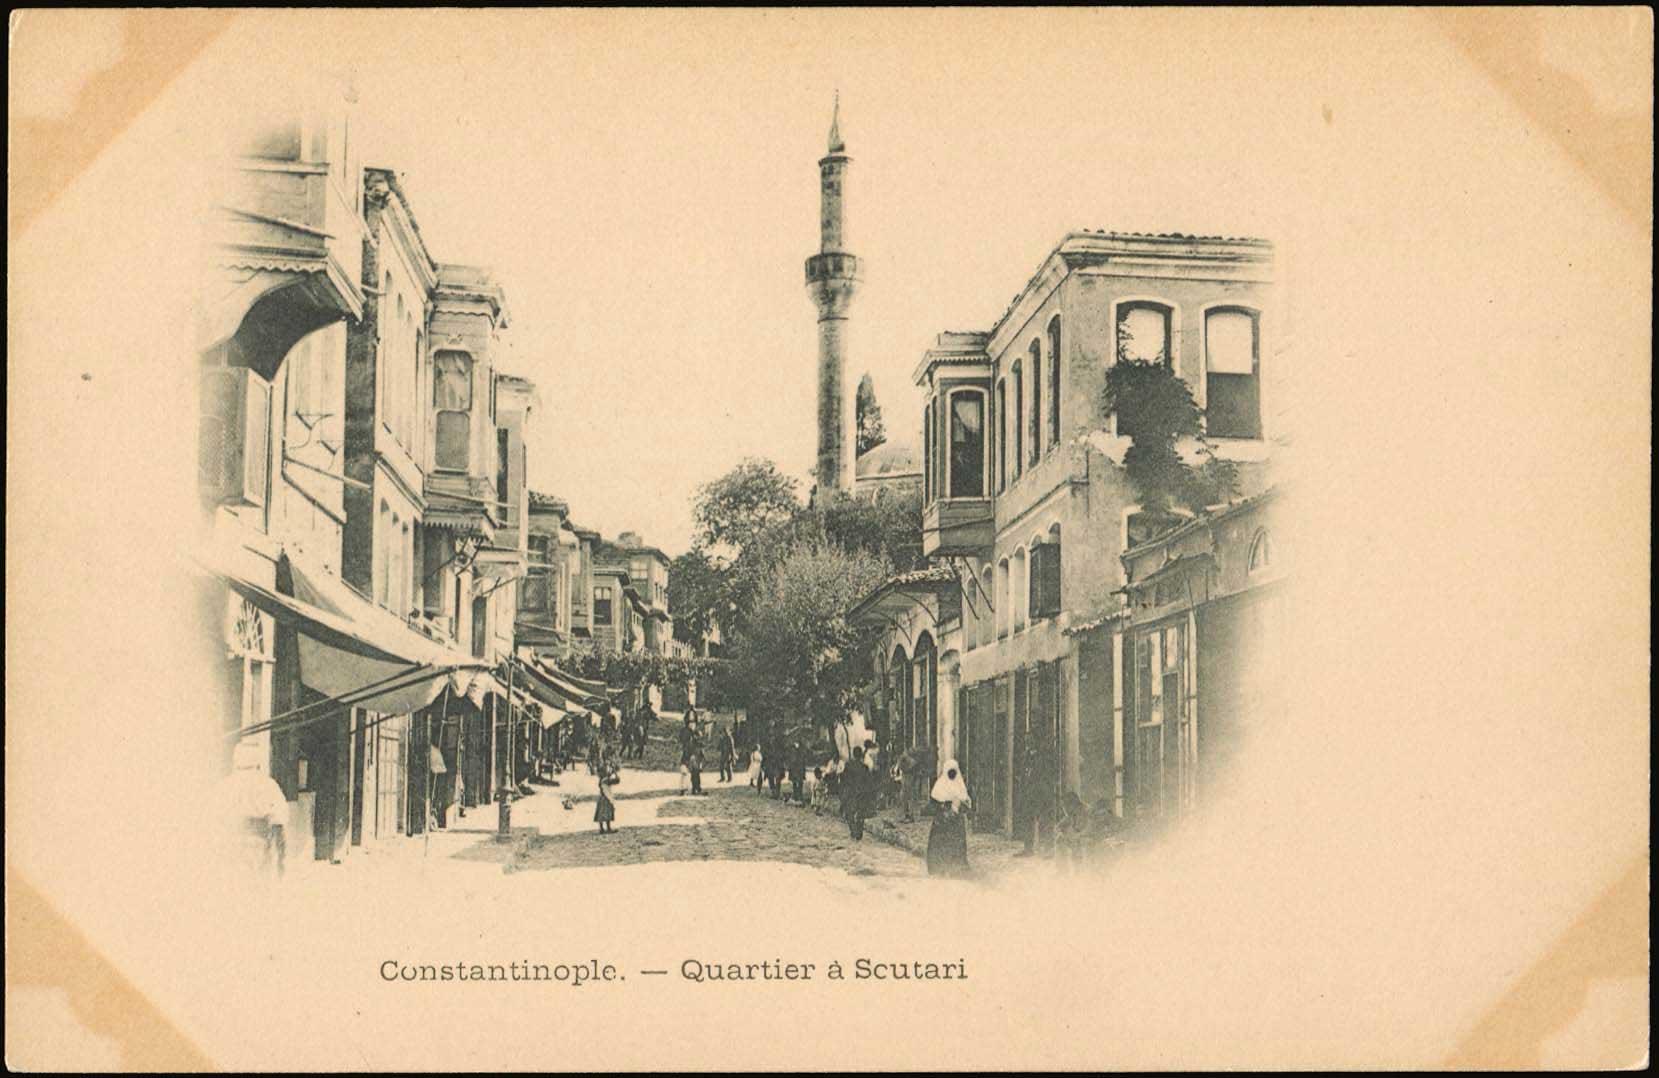 Lot 1557 - picture postcards SMYRNE, CONSTANTINOPLE, ASIA MINOR -  A. Karamitsos Postal & Live Internet Auction 680 General Philatelic Auction